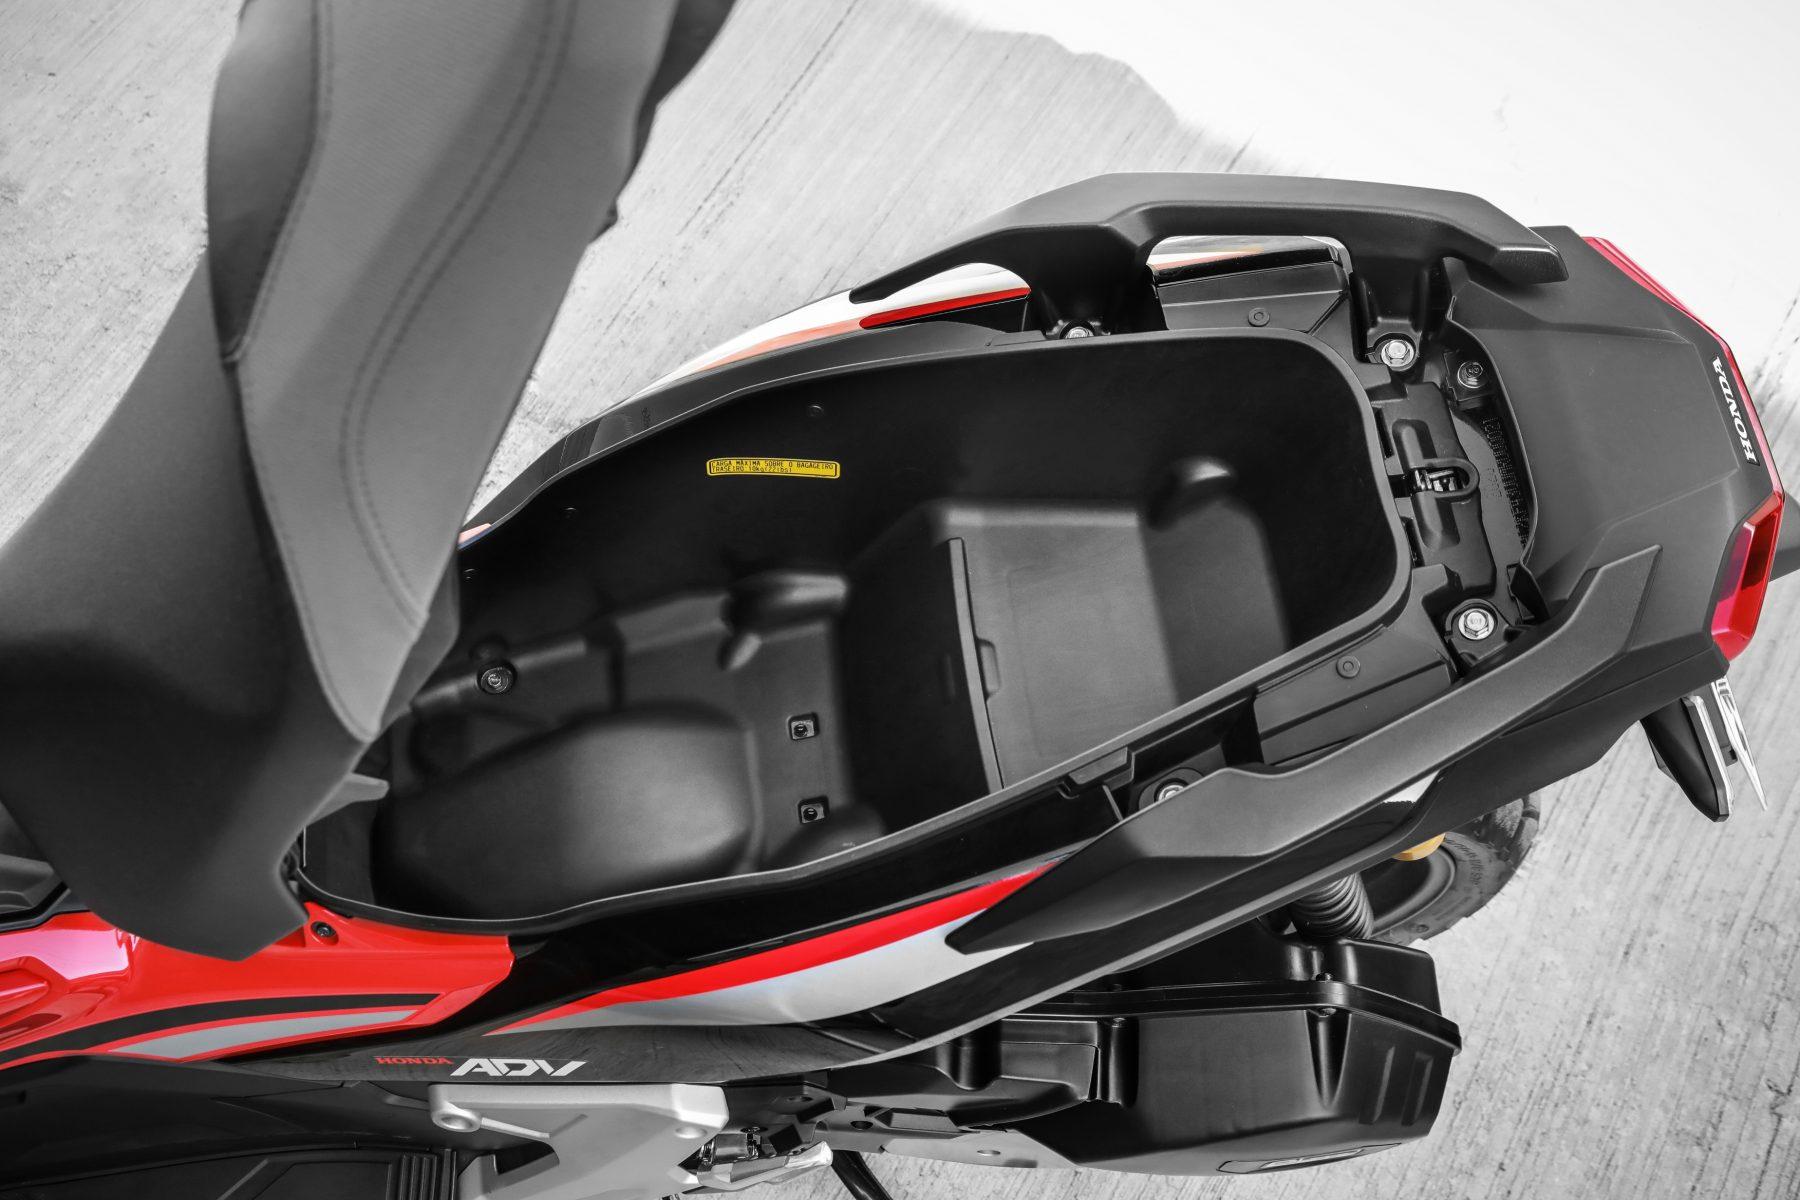 scooter honda adv 150 impressoes 20